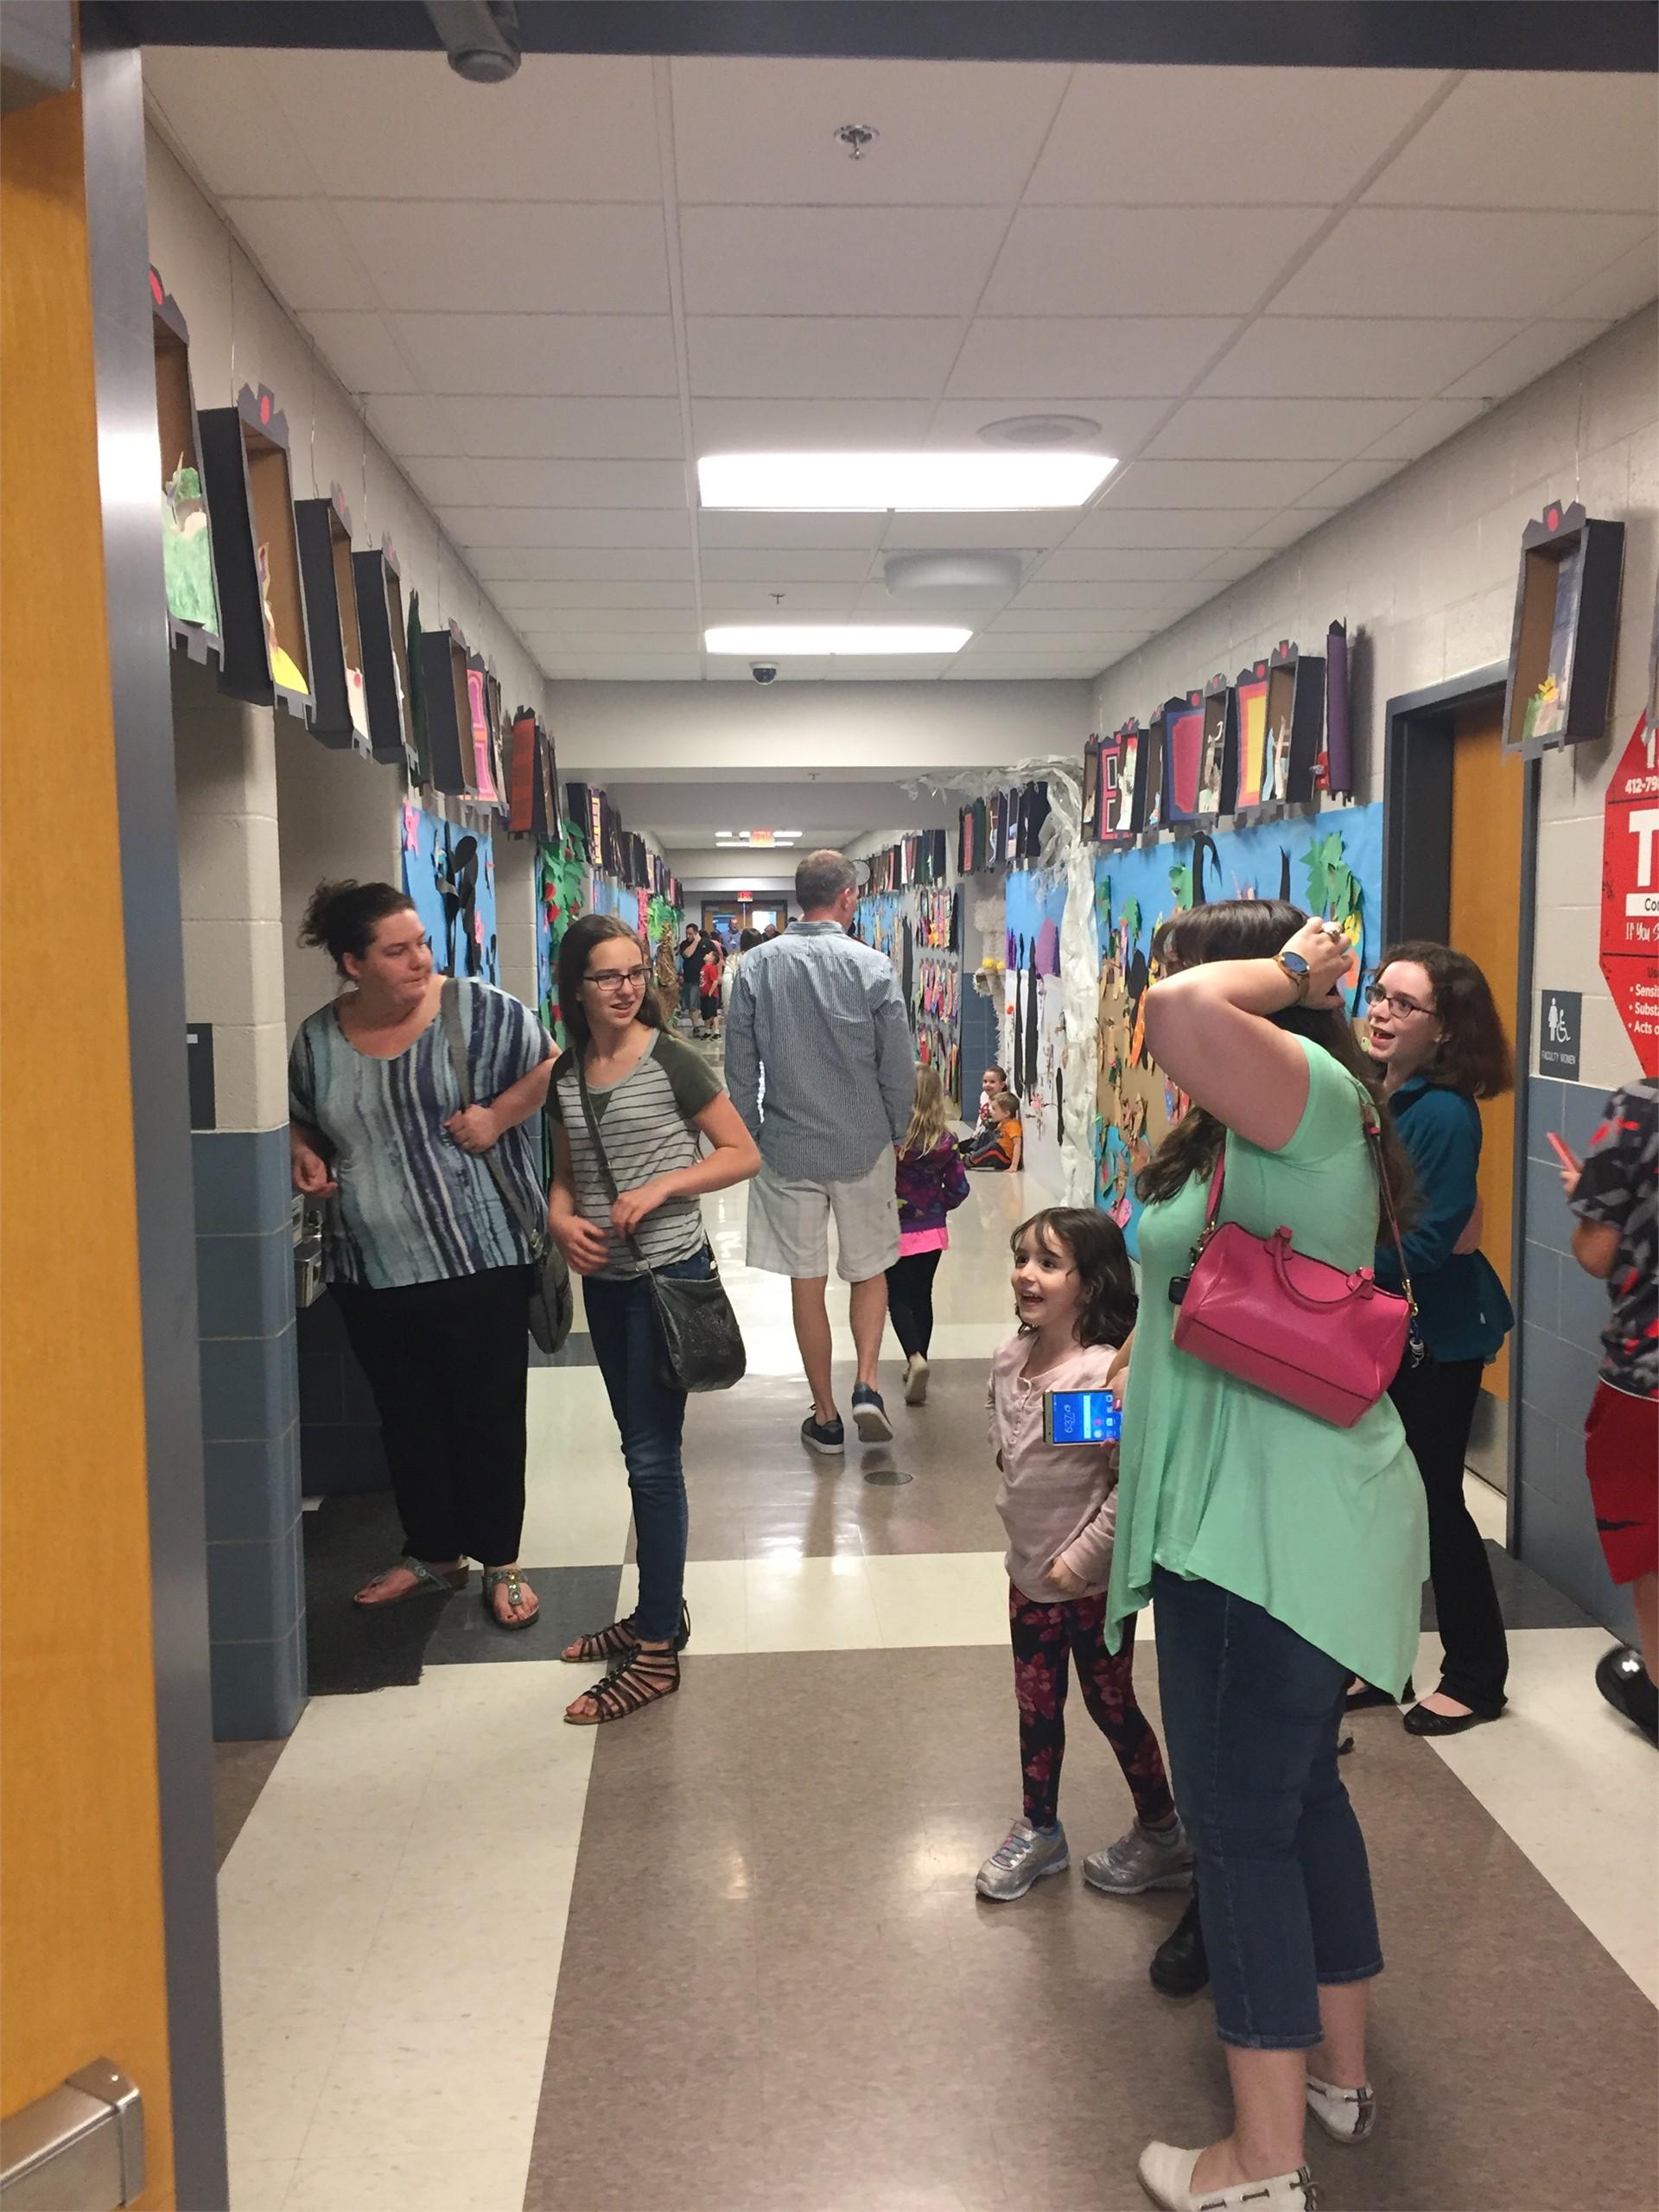 Pivik hallway